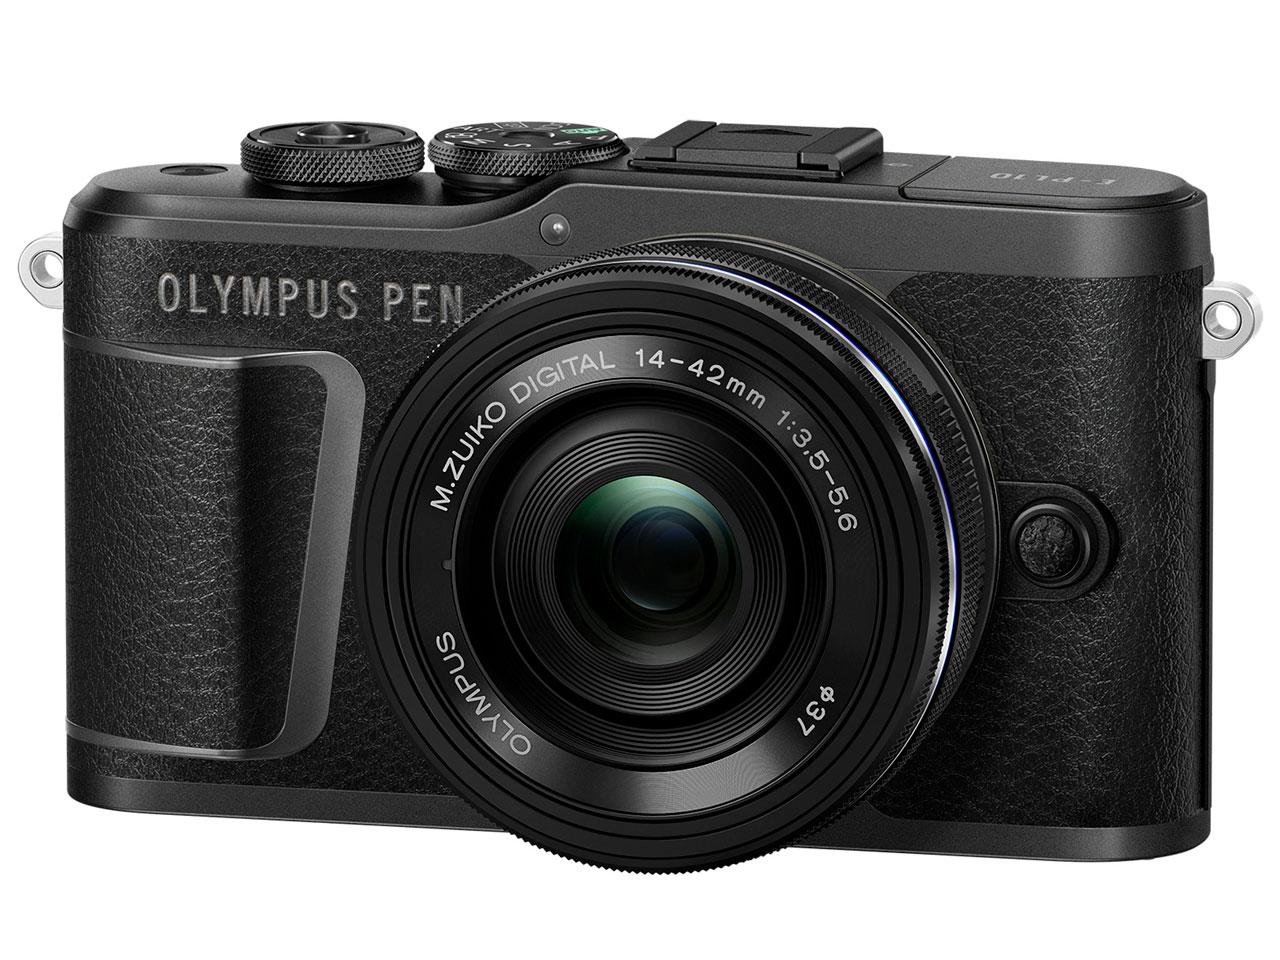 OLYMPUS PEN E-PL10 14-42mm EZレンズキット [ブラック]【お取り寄せ商品(3週間~4週間程度での入荷、発送)】